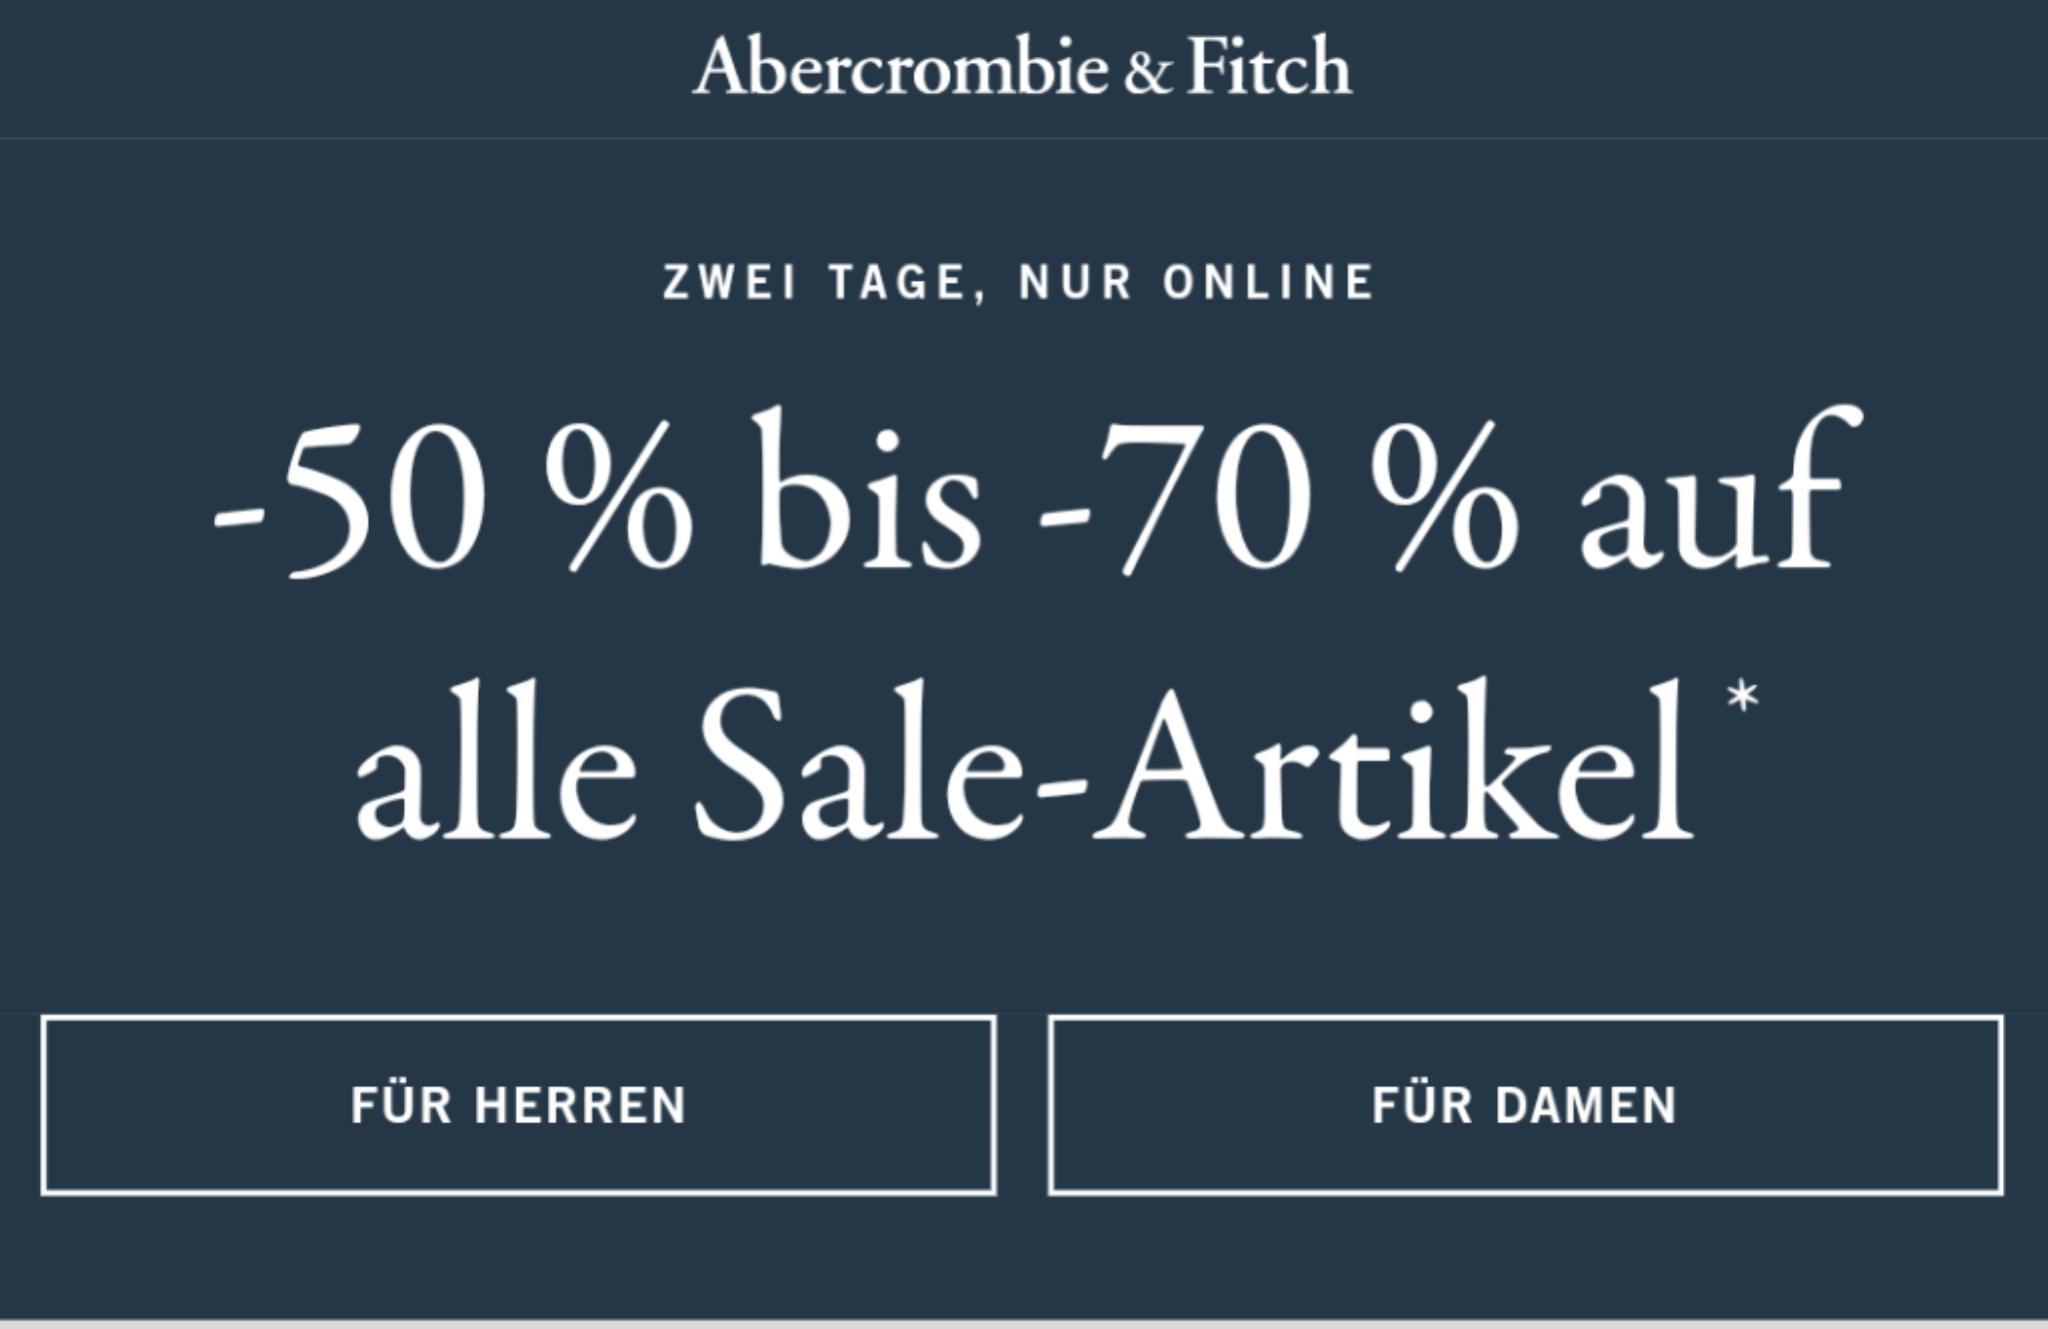 50-70% Auf Sale bei Abercrombie & Fitch